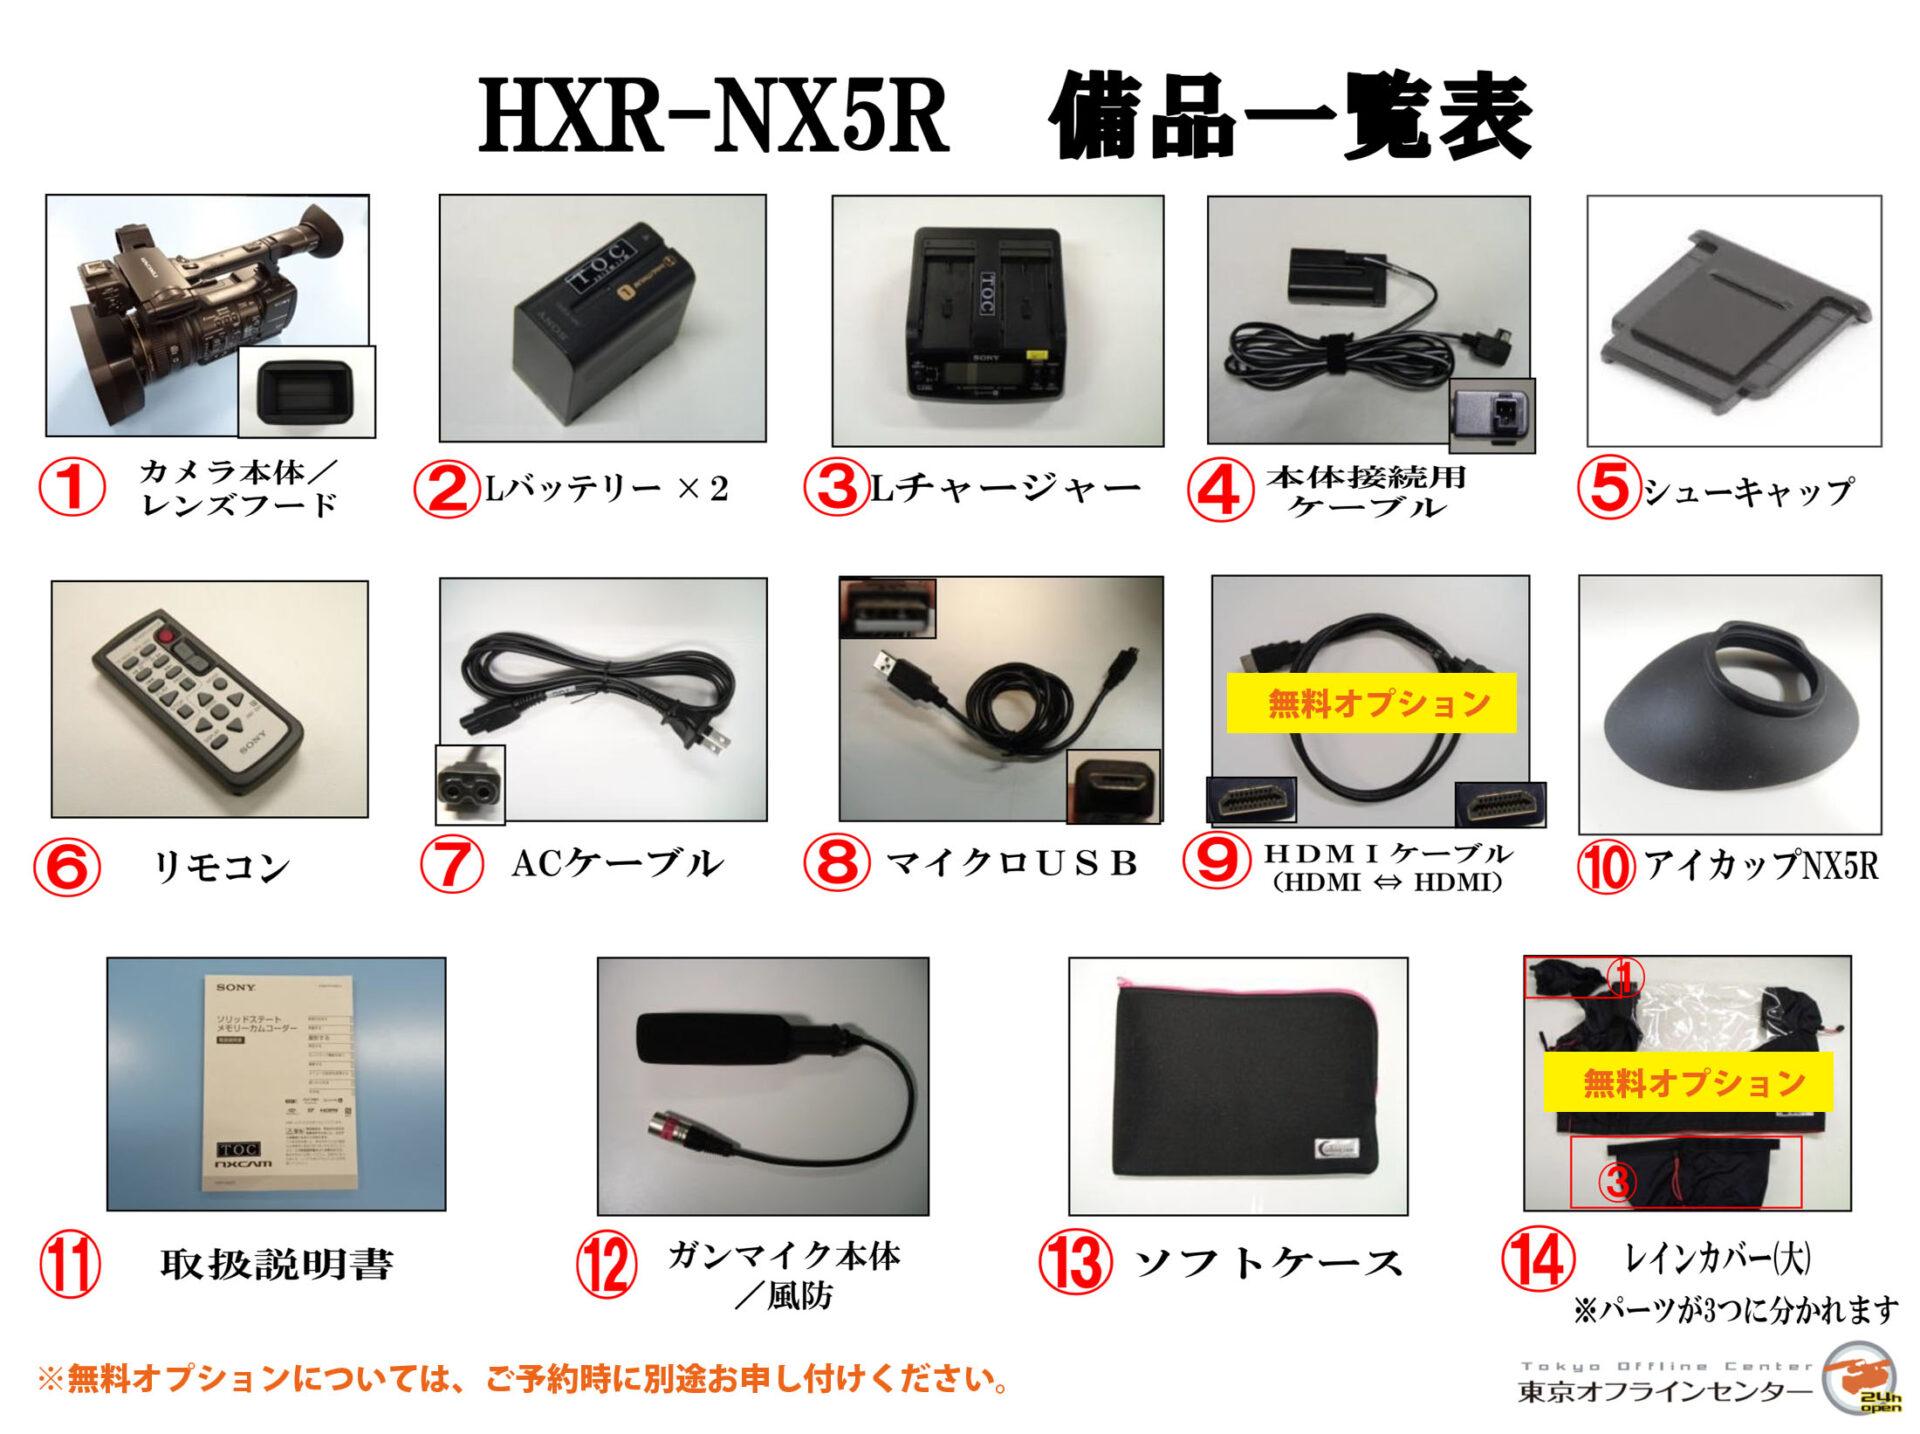 HXR-NX5R 備品一覧表